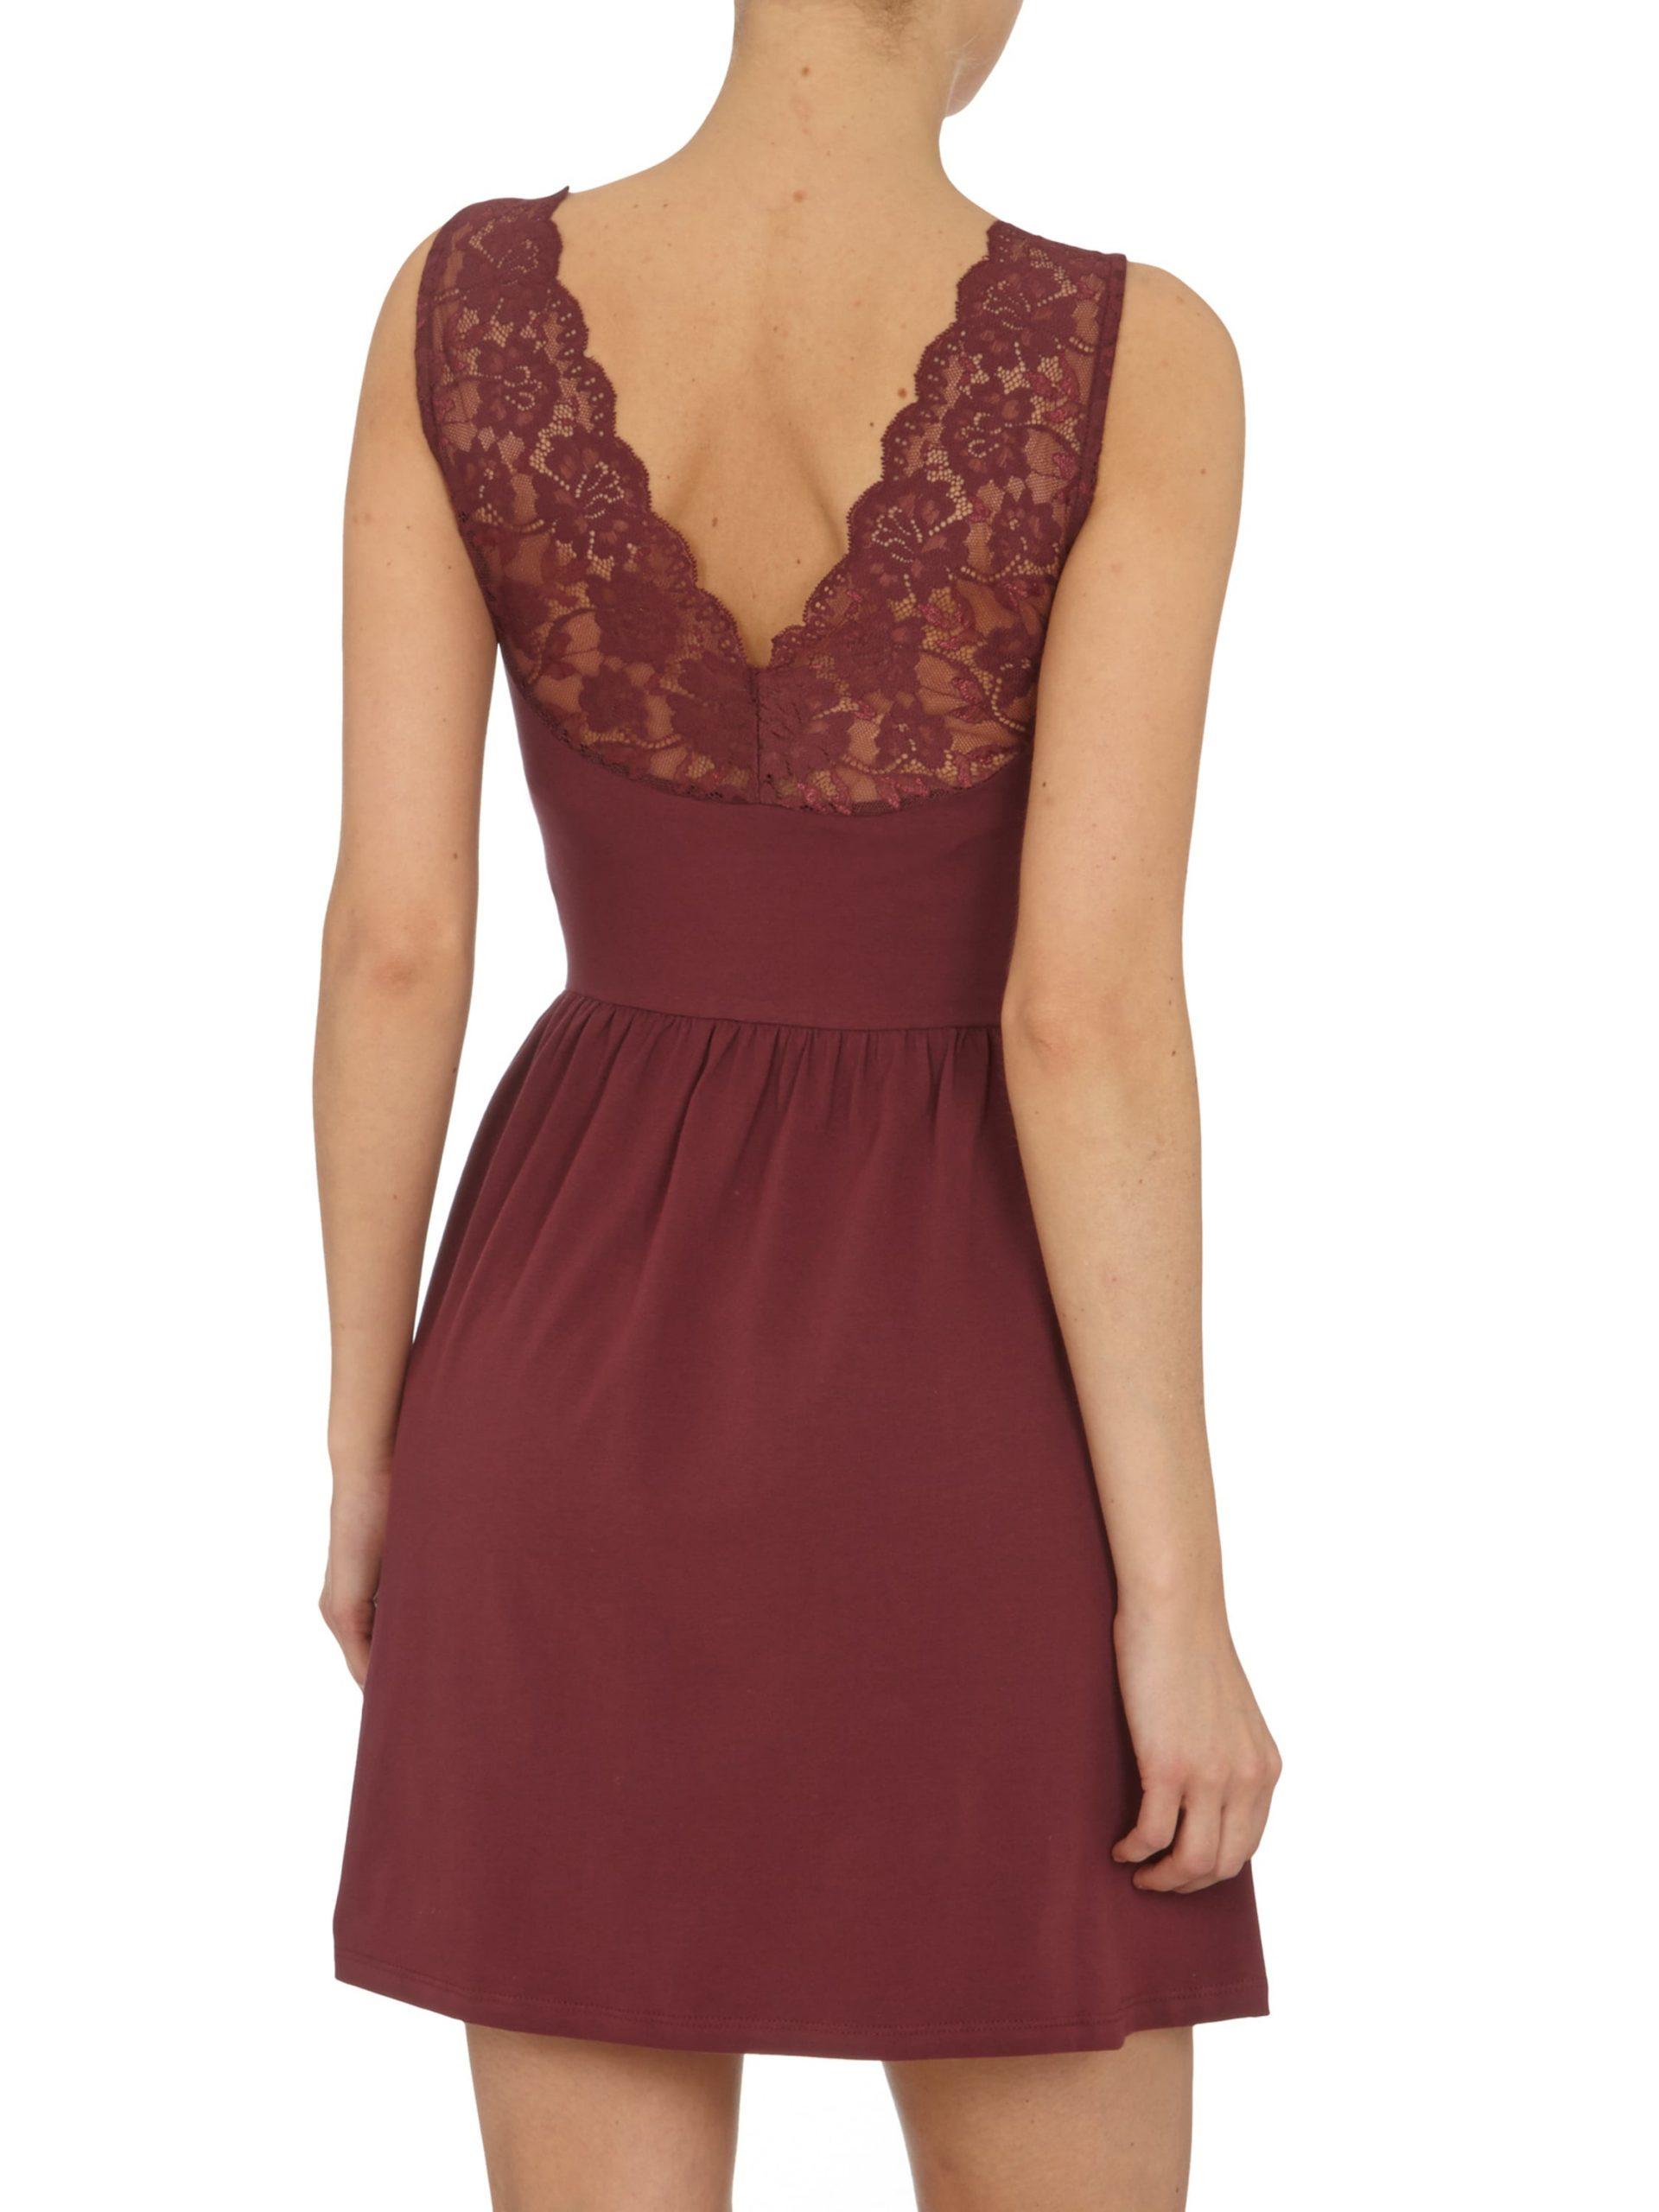 13 Genial Kleid Spitze Bordeaux Bester PreisFormal Ausgezeichnet Kleid Spitze Bordeaux Spezialgebiet